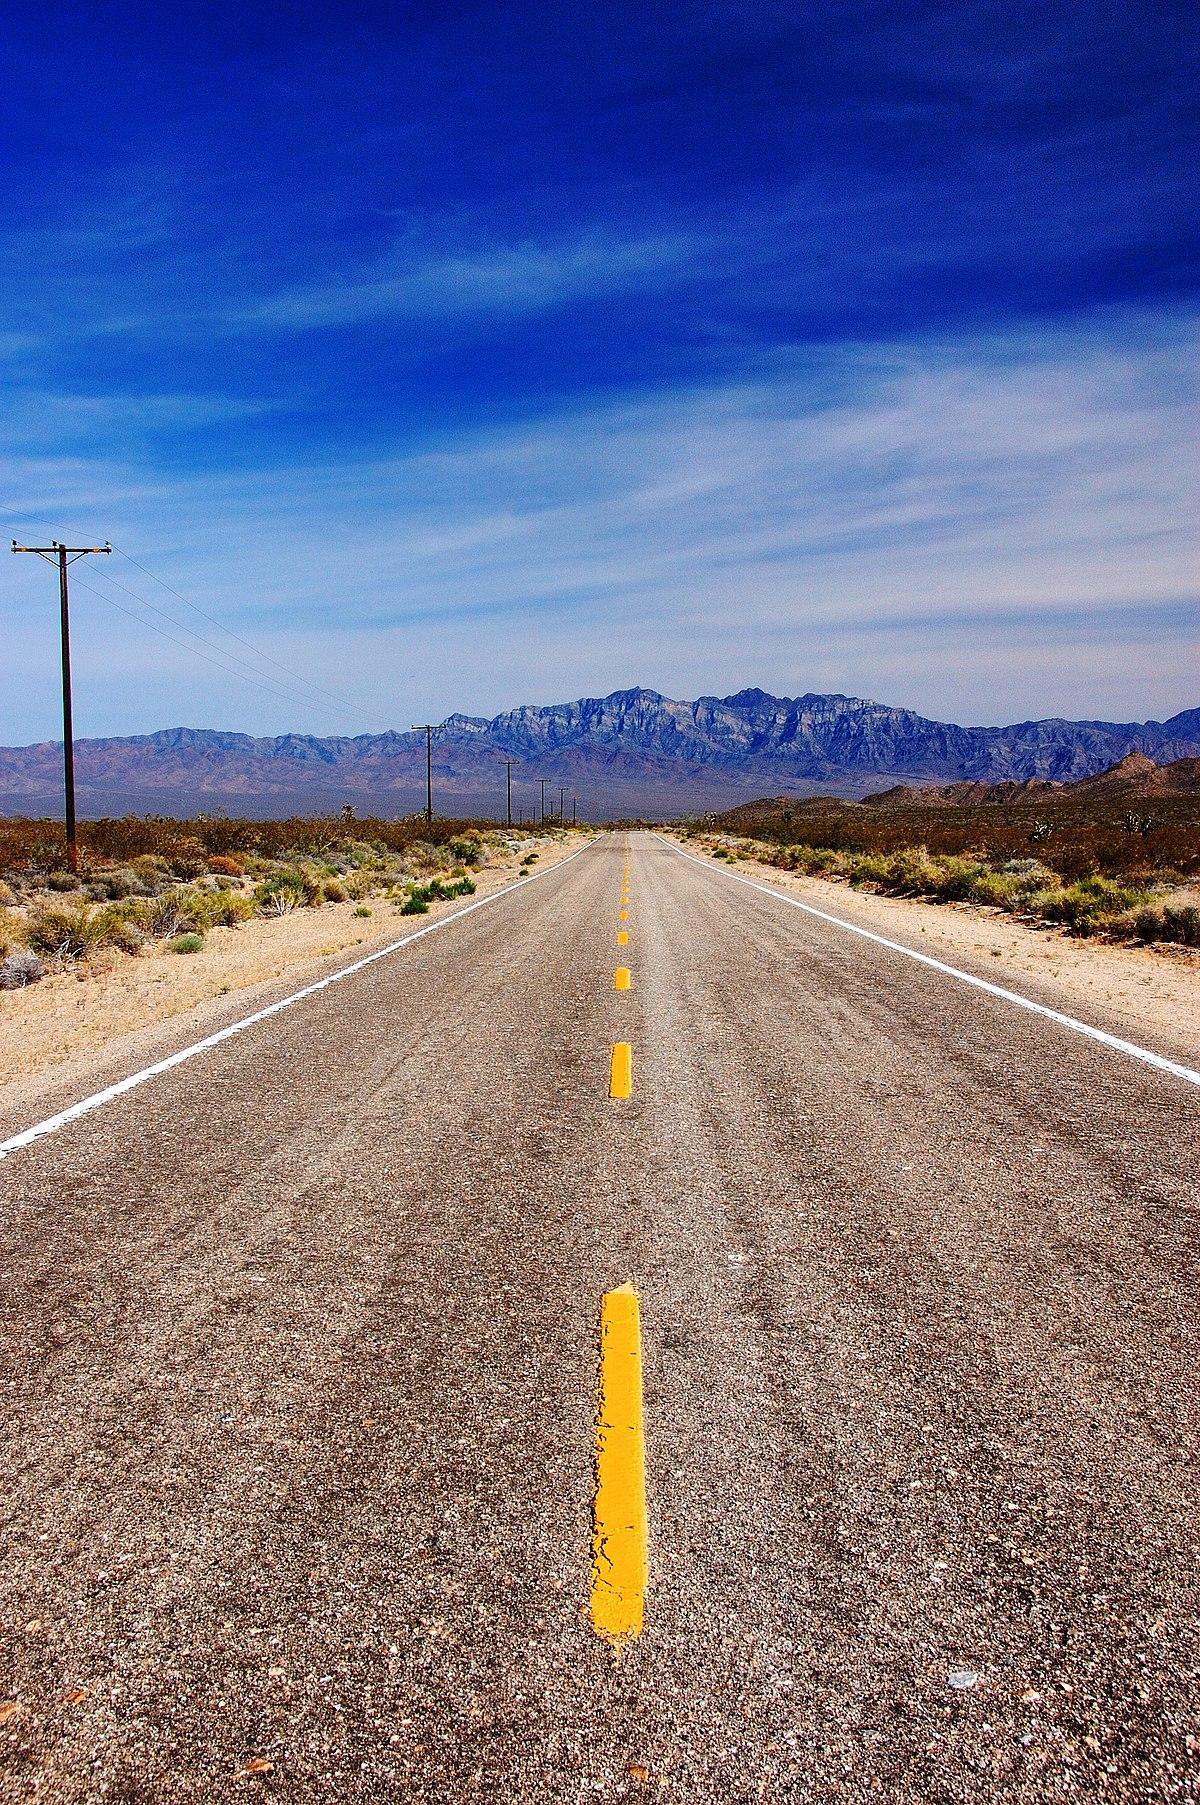 Ruta Estatal de California 127 - Wikipedia, la ...